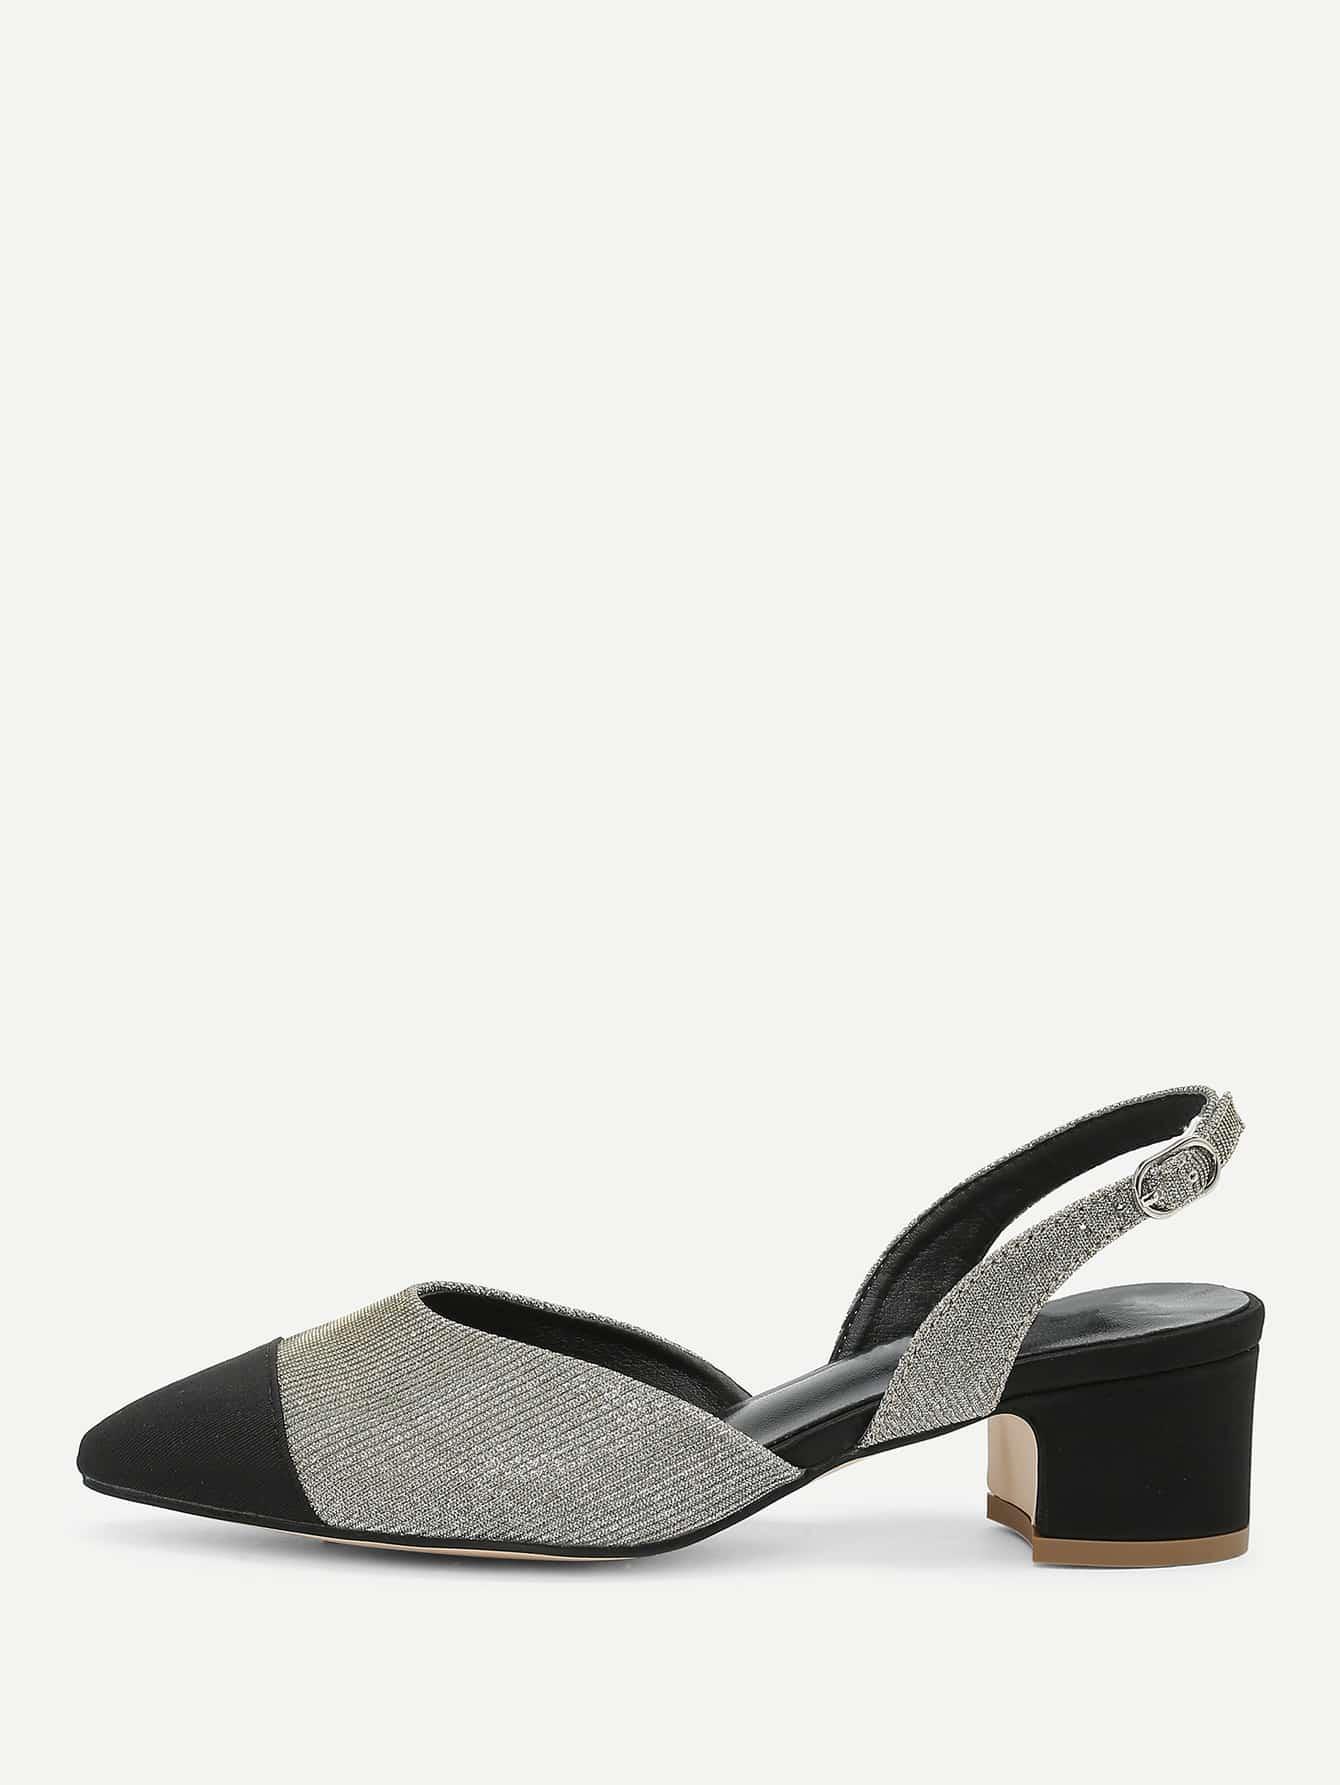 Pointed Toe Slingback Flats pointed toe tie leg flats